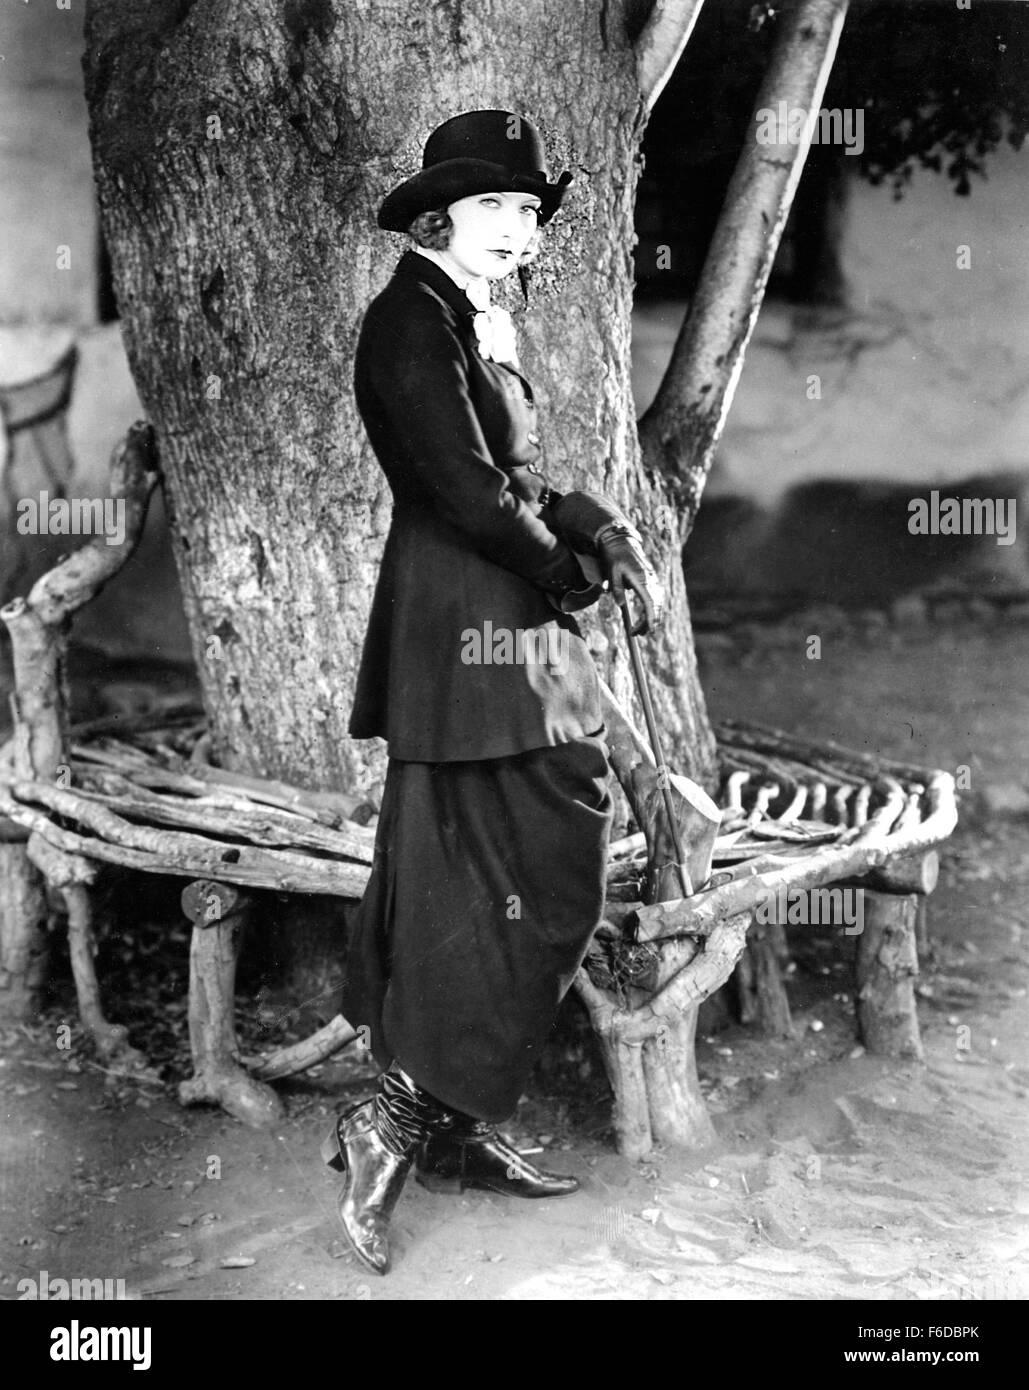 RELEASE DATE: January 2, 1928  MOVIE TITLE: Love  STUDIO Stock Photo